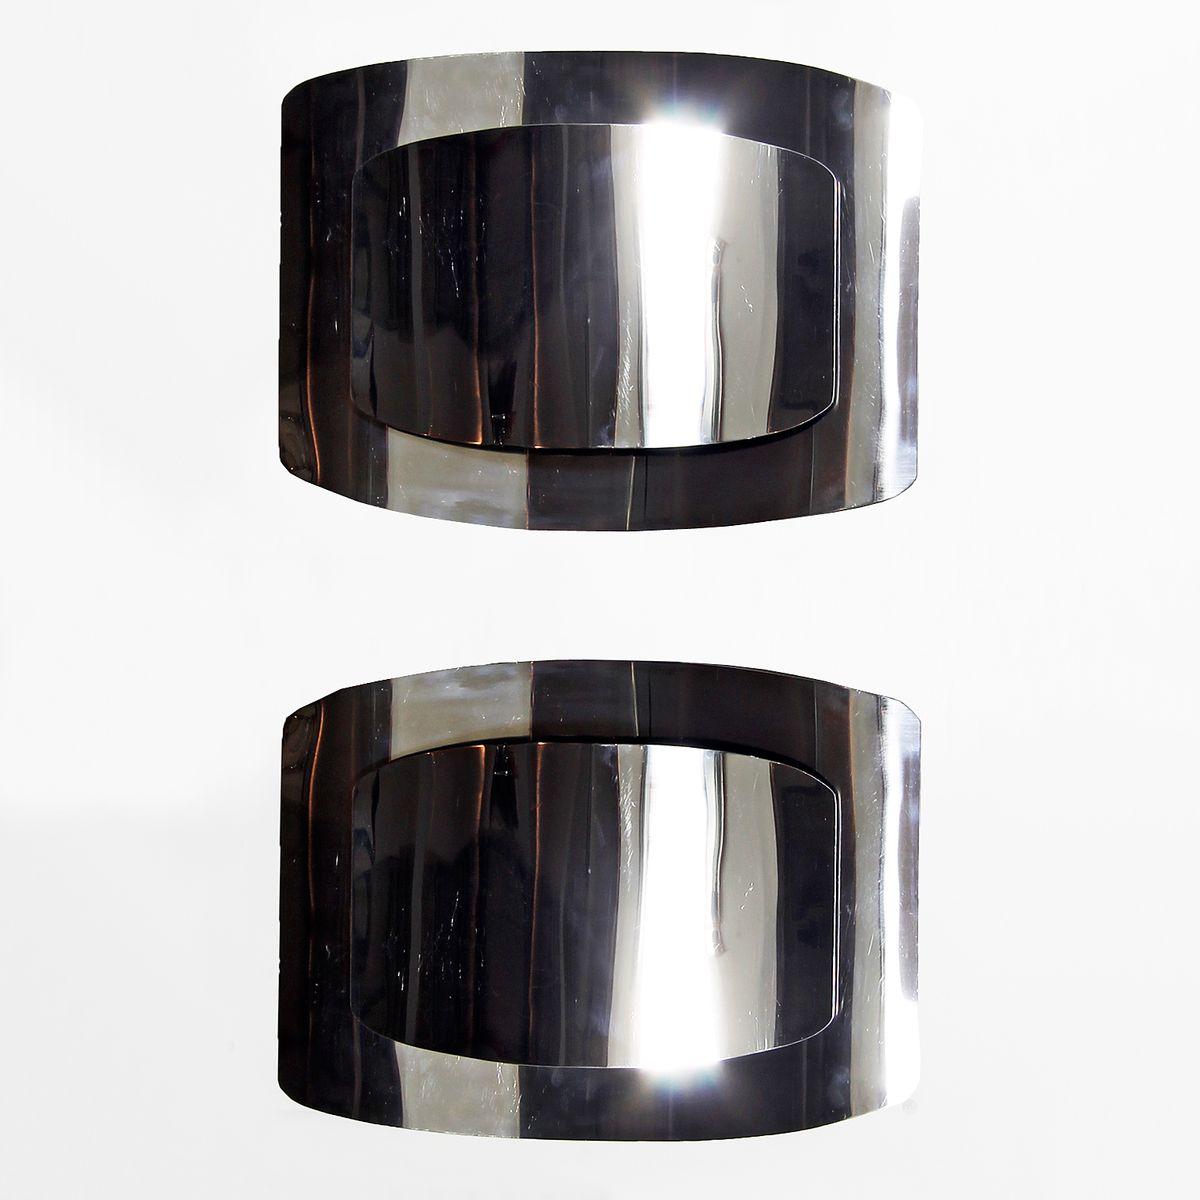 Vernickelte Italienische Messing Wandlampen, 1970er, 2er Set